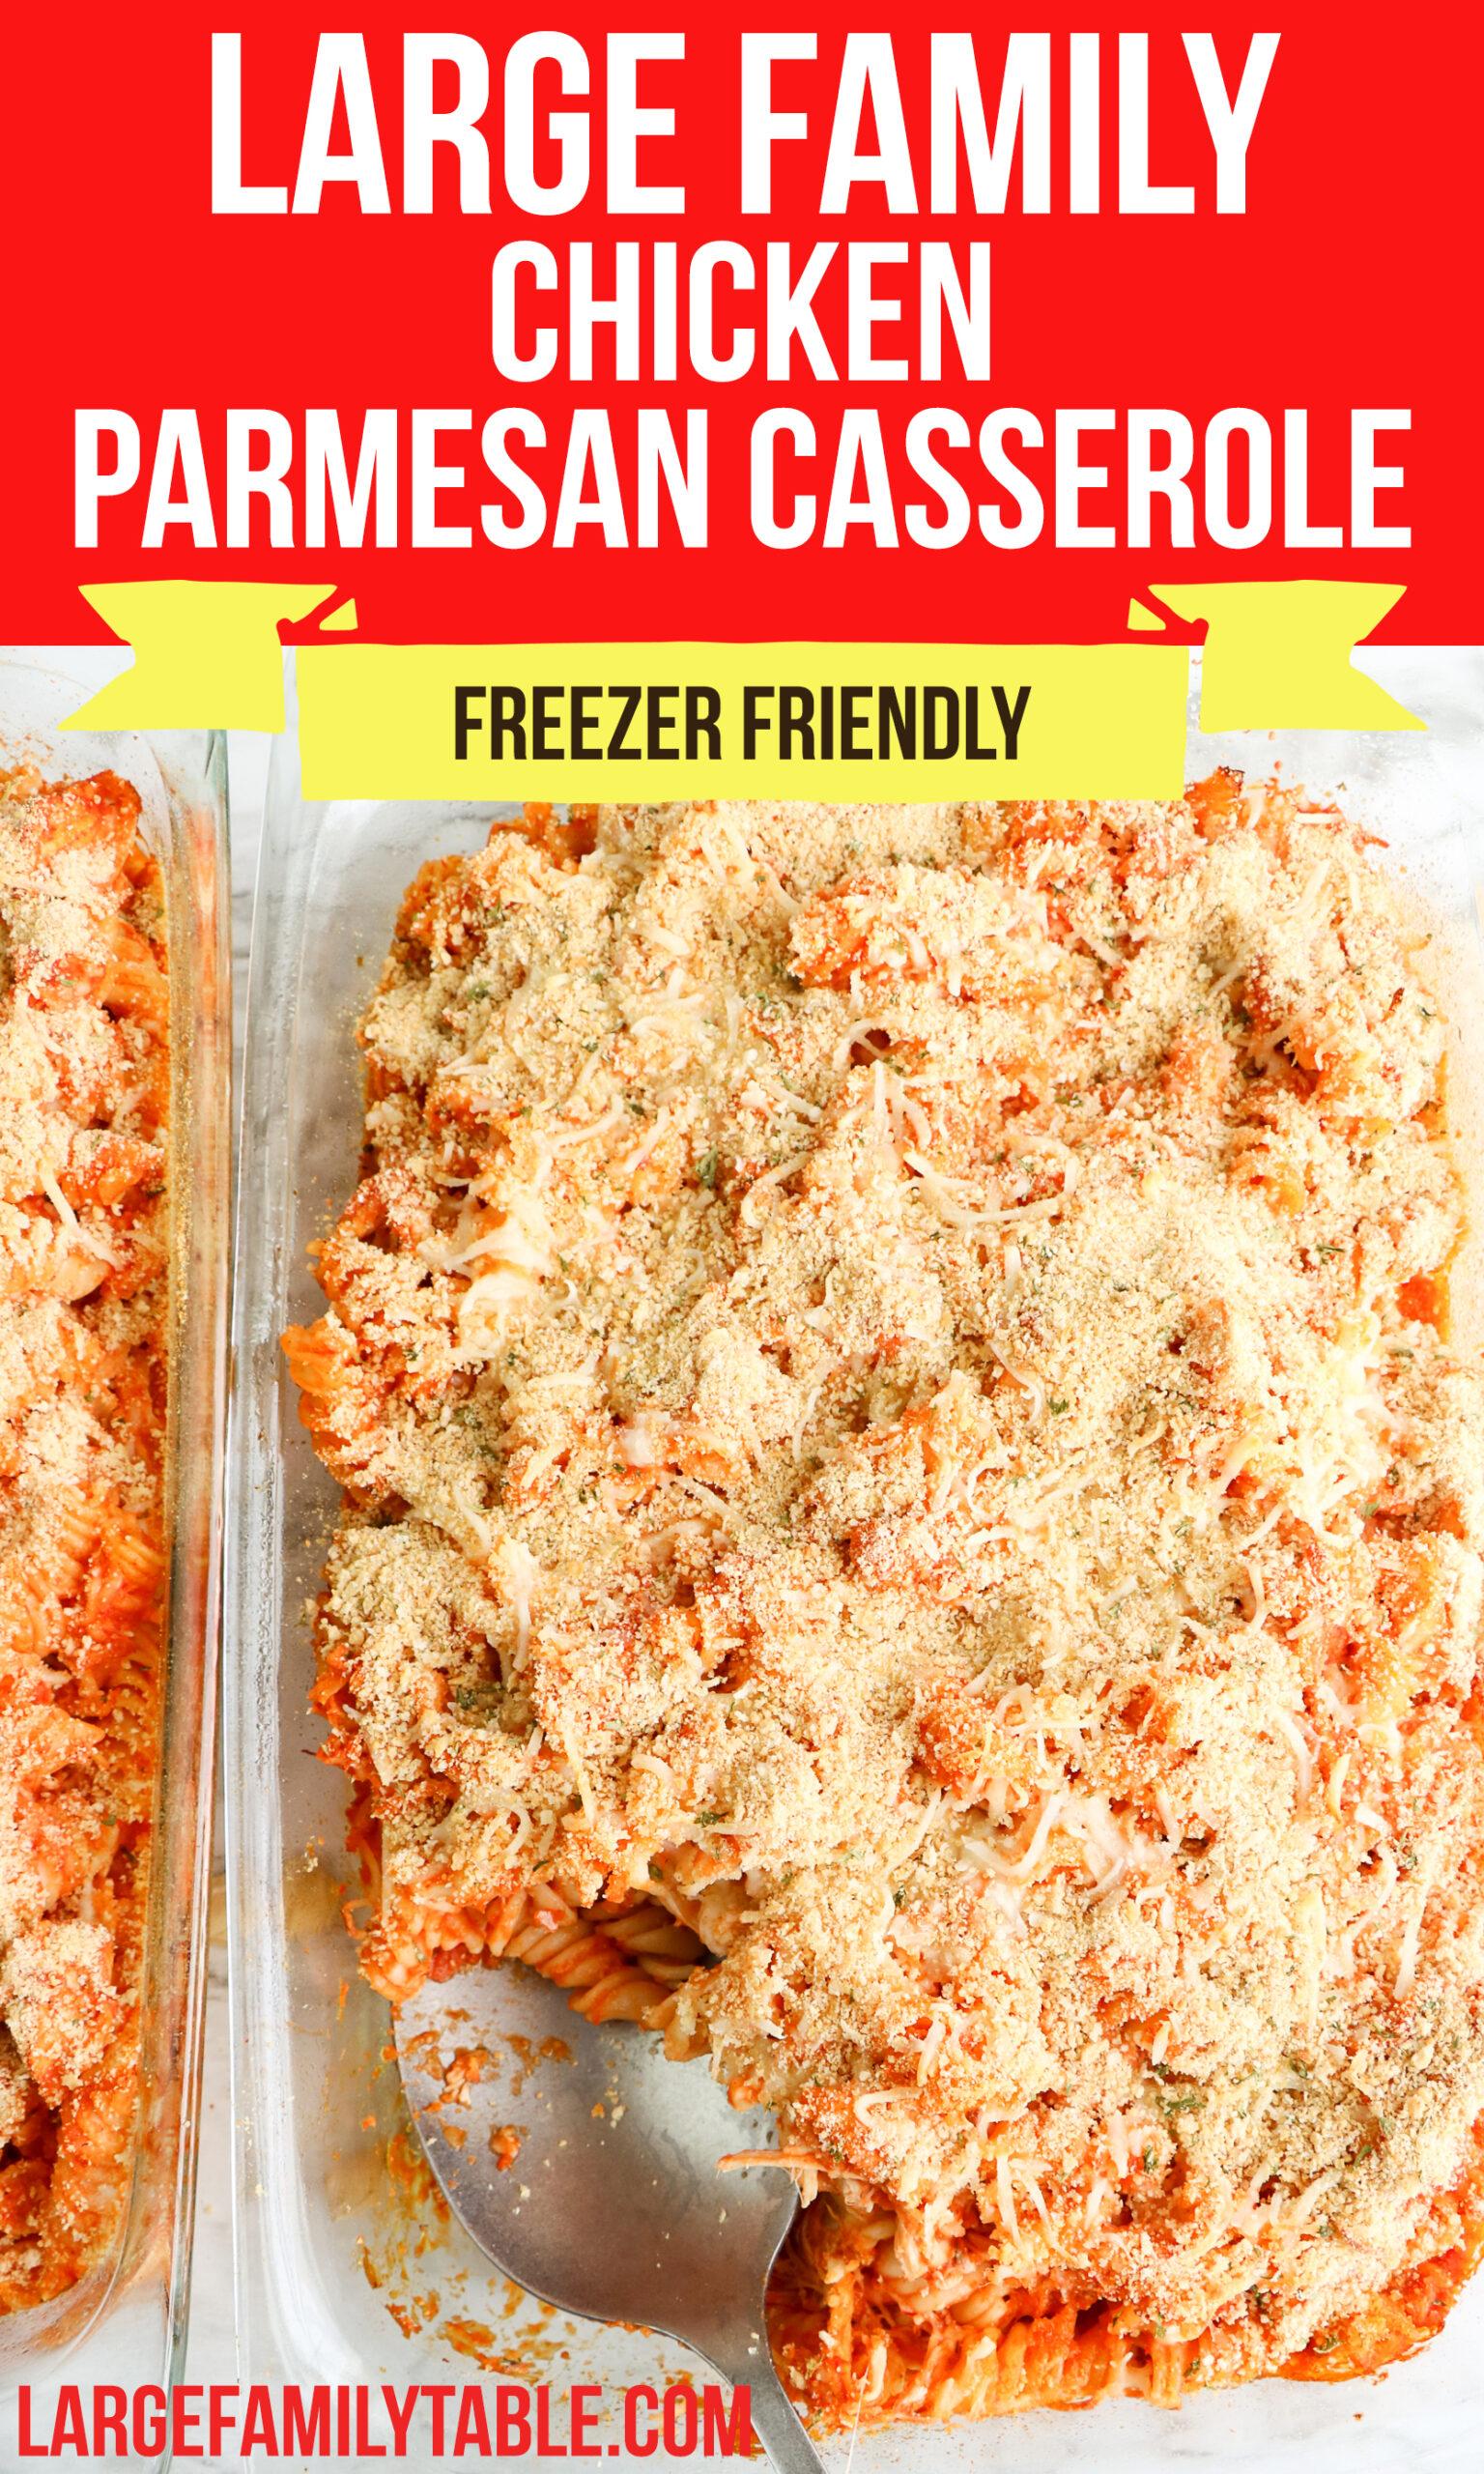 Large Family Chicken Parmesan Casserole